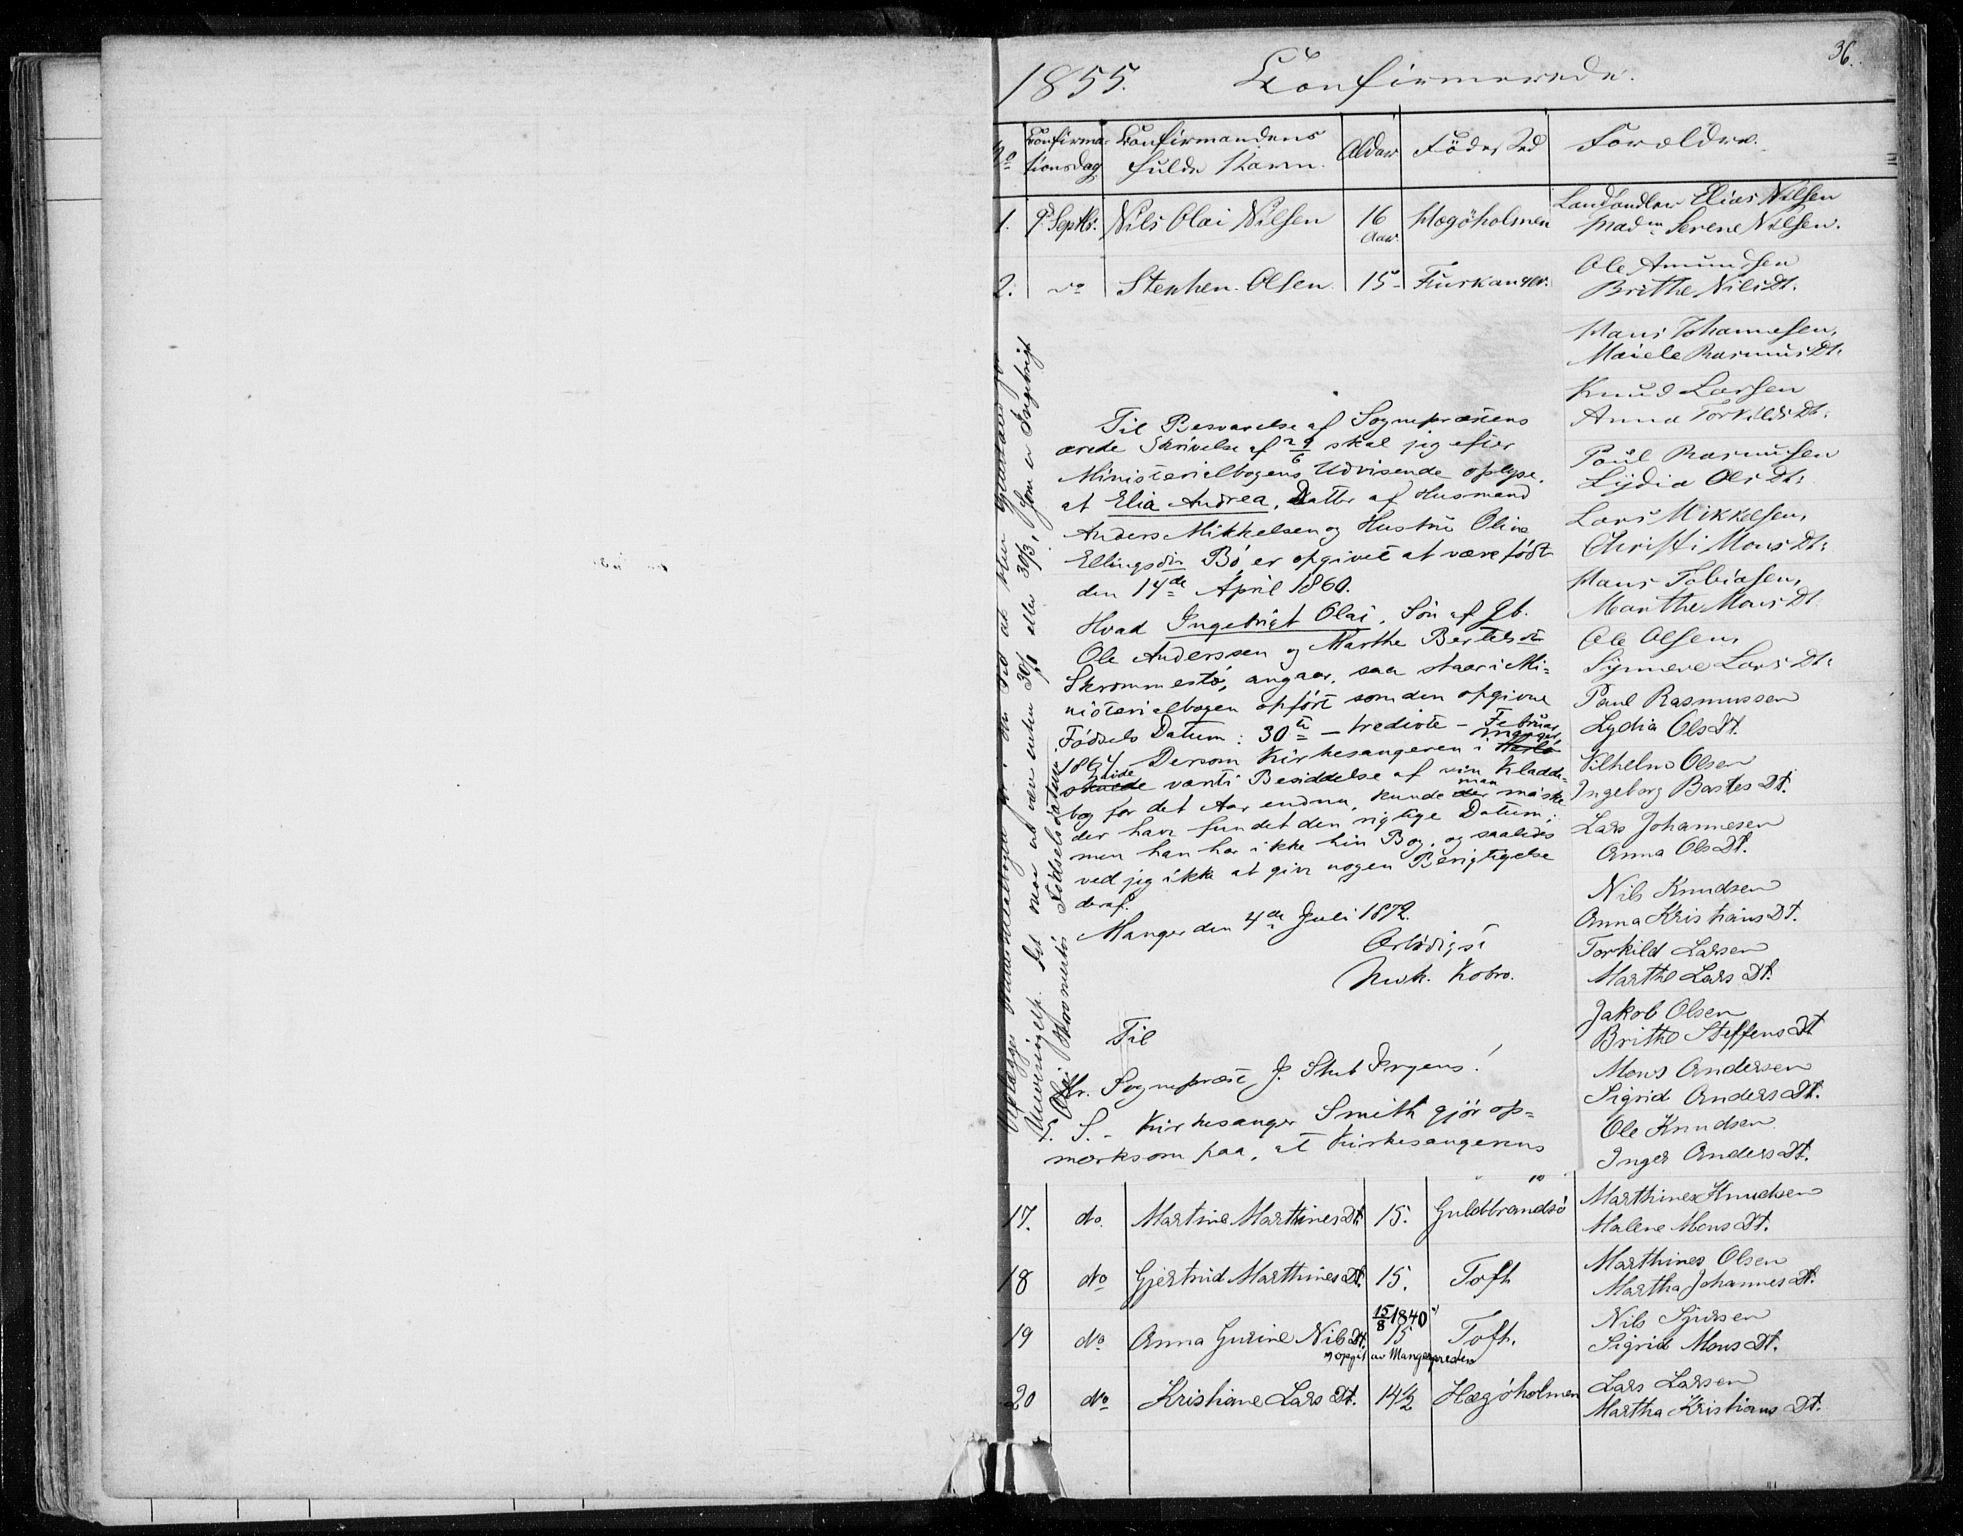 SAB, Herdla Sokneprestembete, H/Haa: Ministerialbok nr. A 1, 1855-1869, s. 36